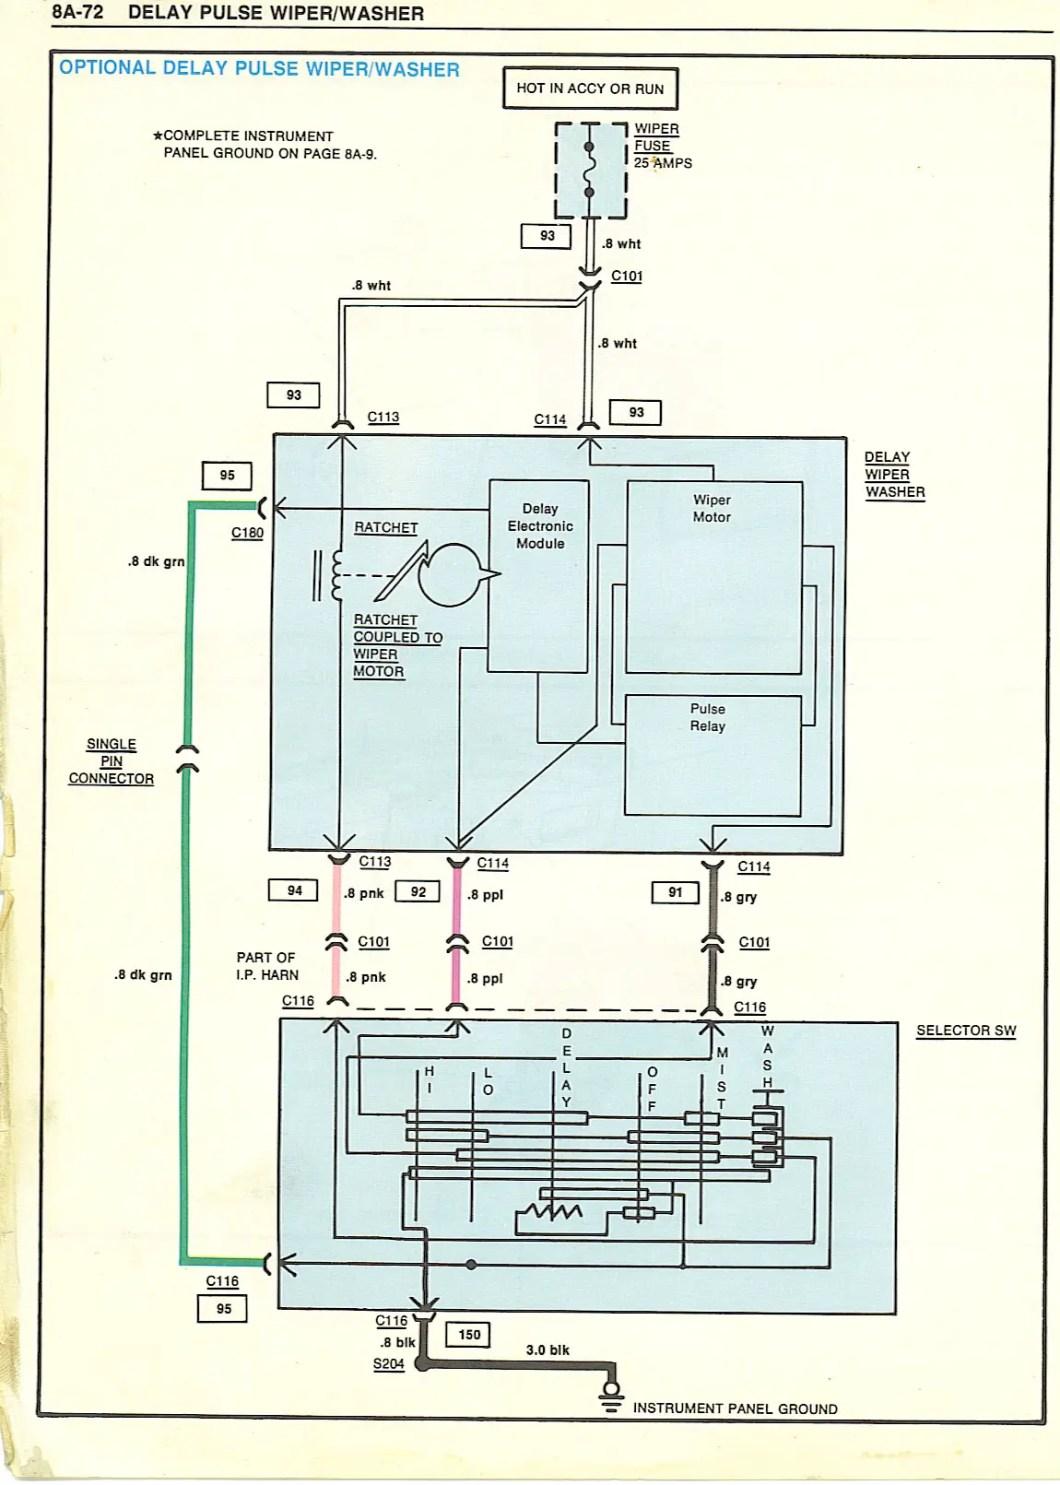 Boat Wiper Motor Wiring Diagram | Newmotorspot.co